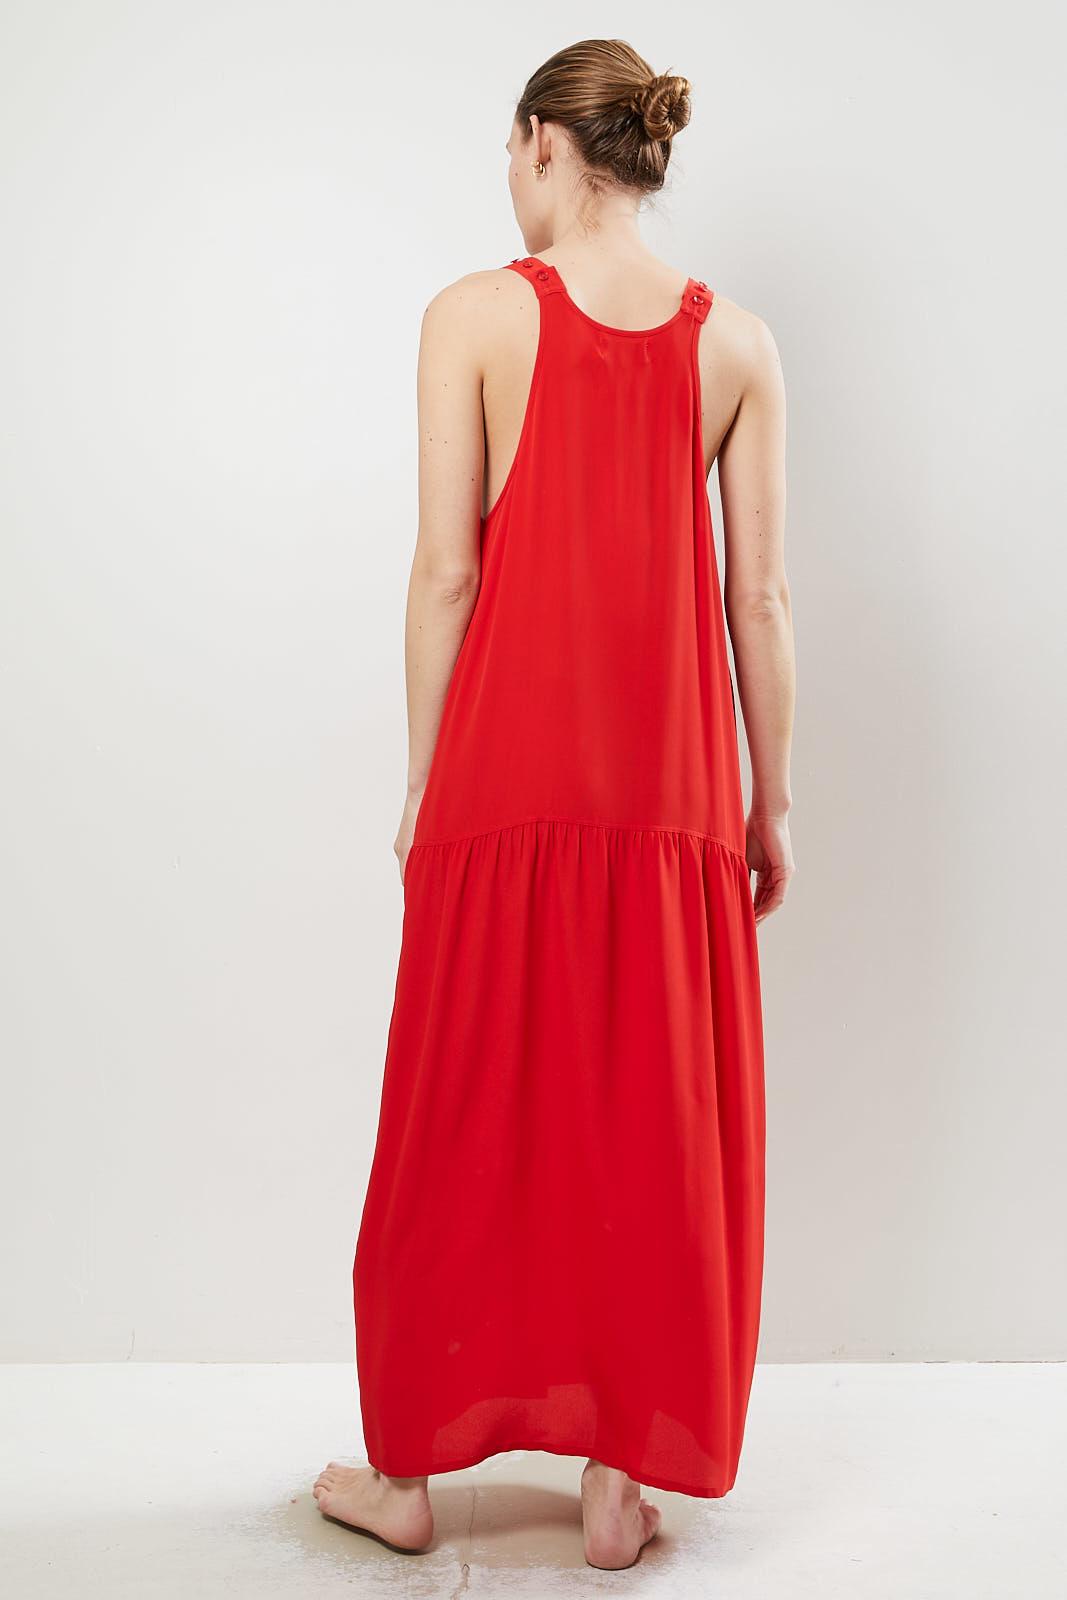 Monique van Heist daisy silk dress